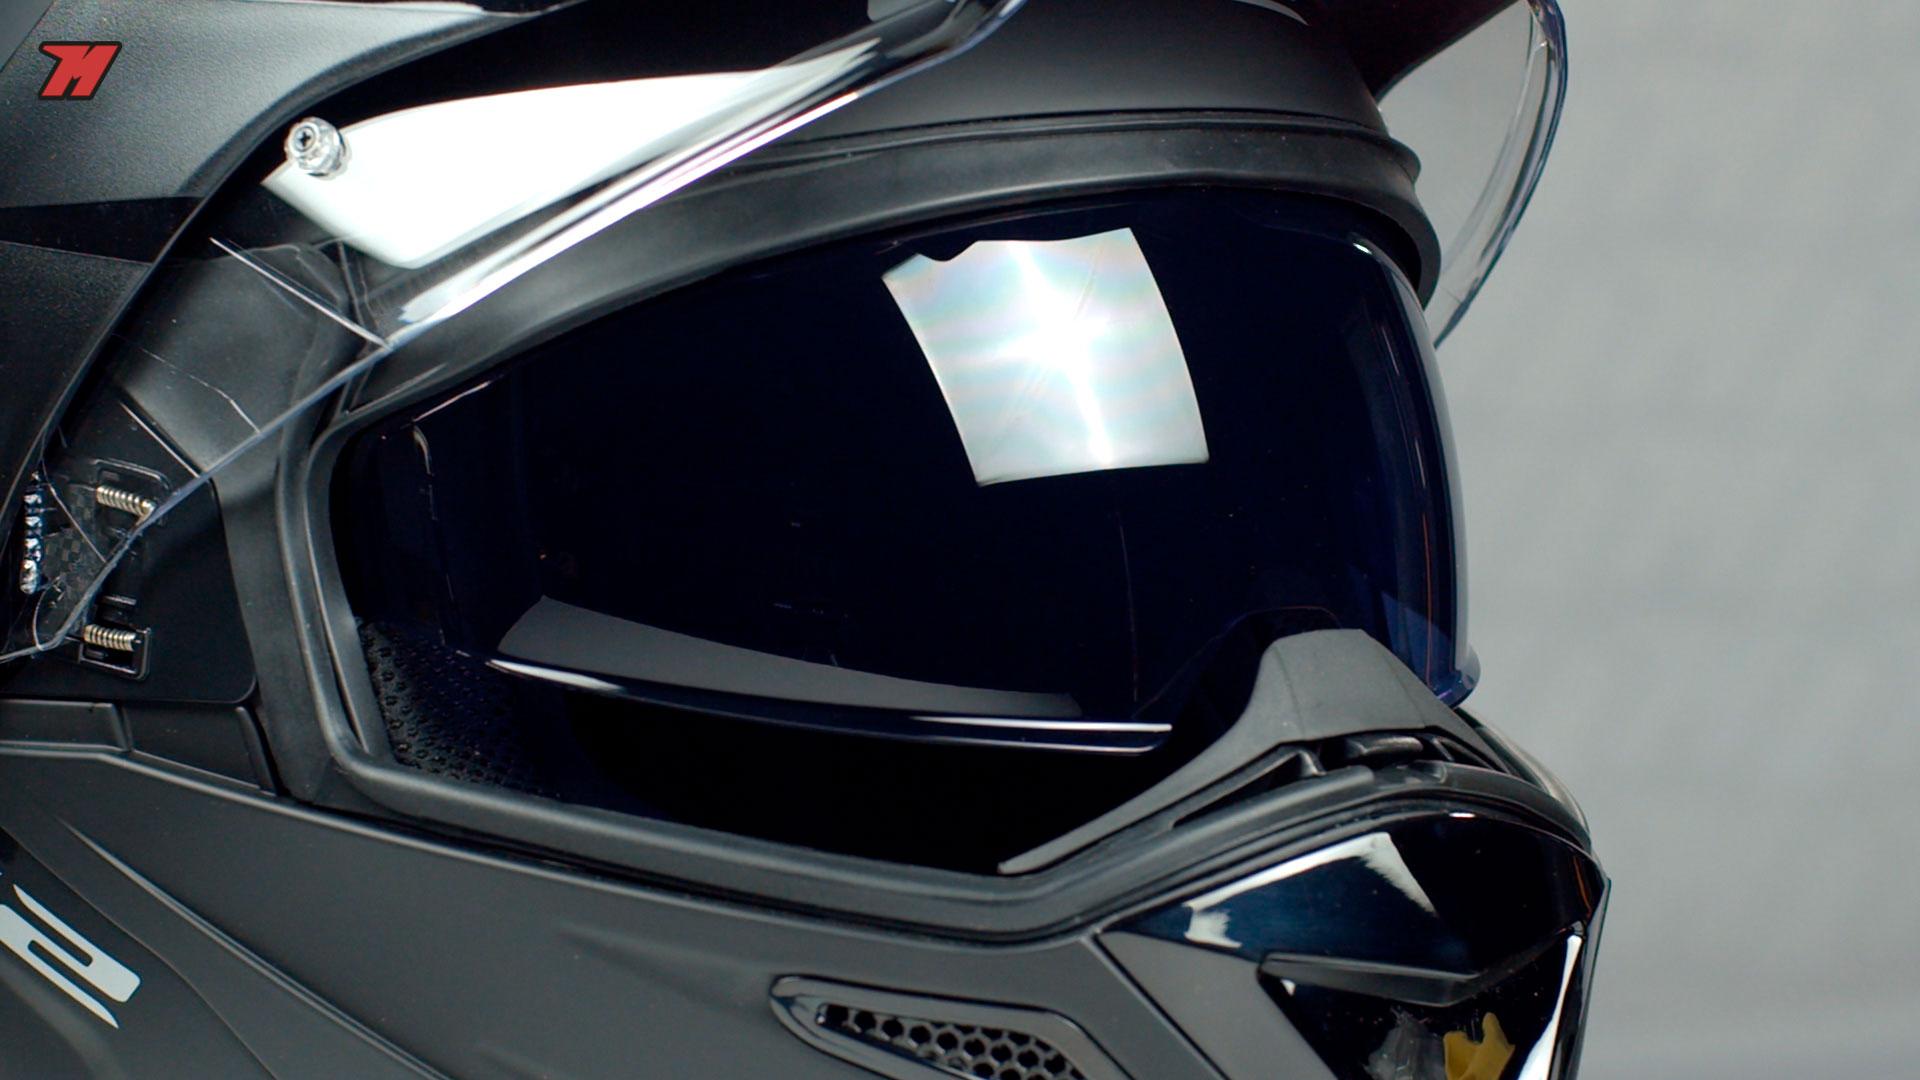 LS2 FF324 Metro Evo P/J, an adventure and modular helmet